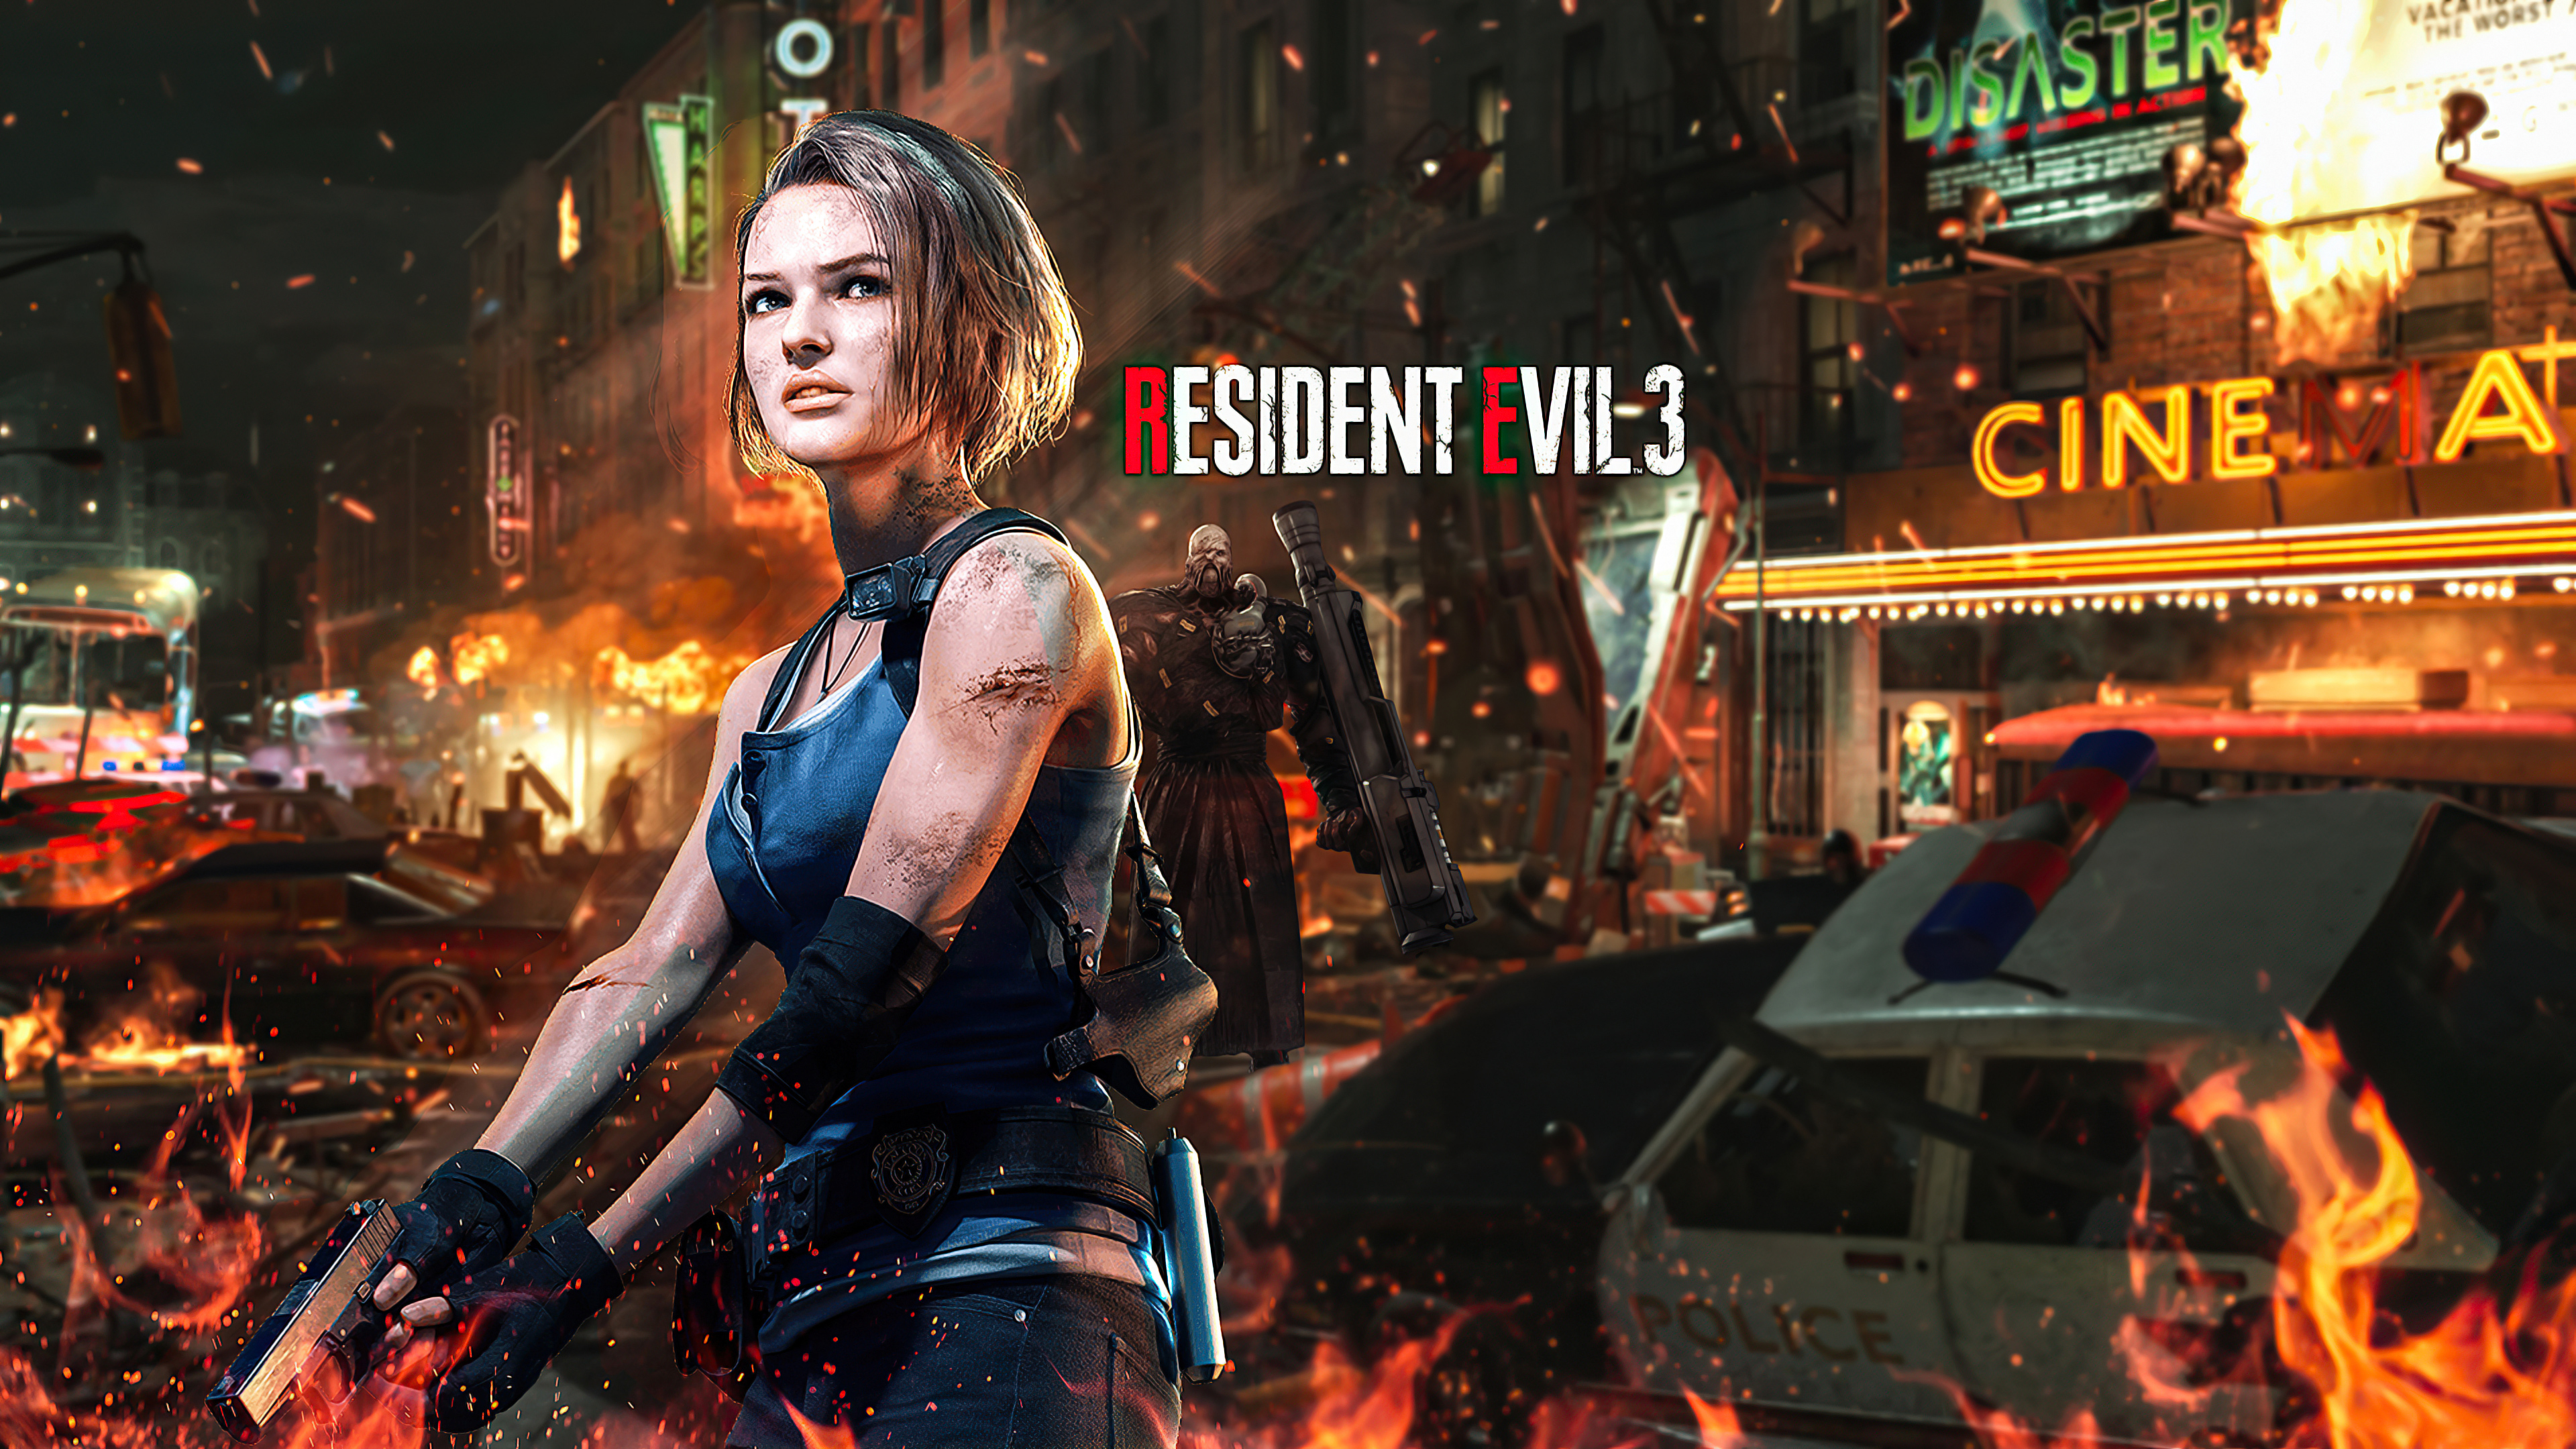 Jill Valentine Resident Evil 3 4k 2020 Hd Games 4k Wallpapers